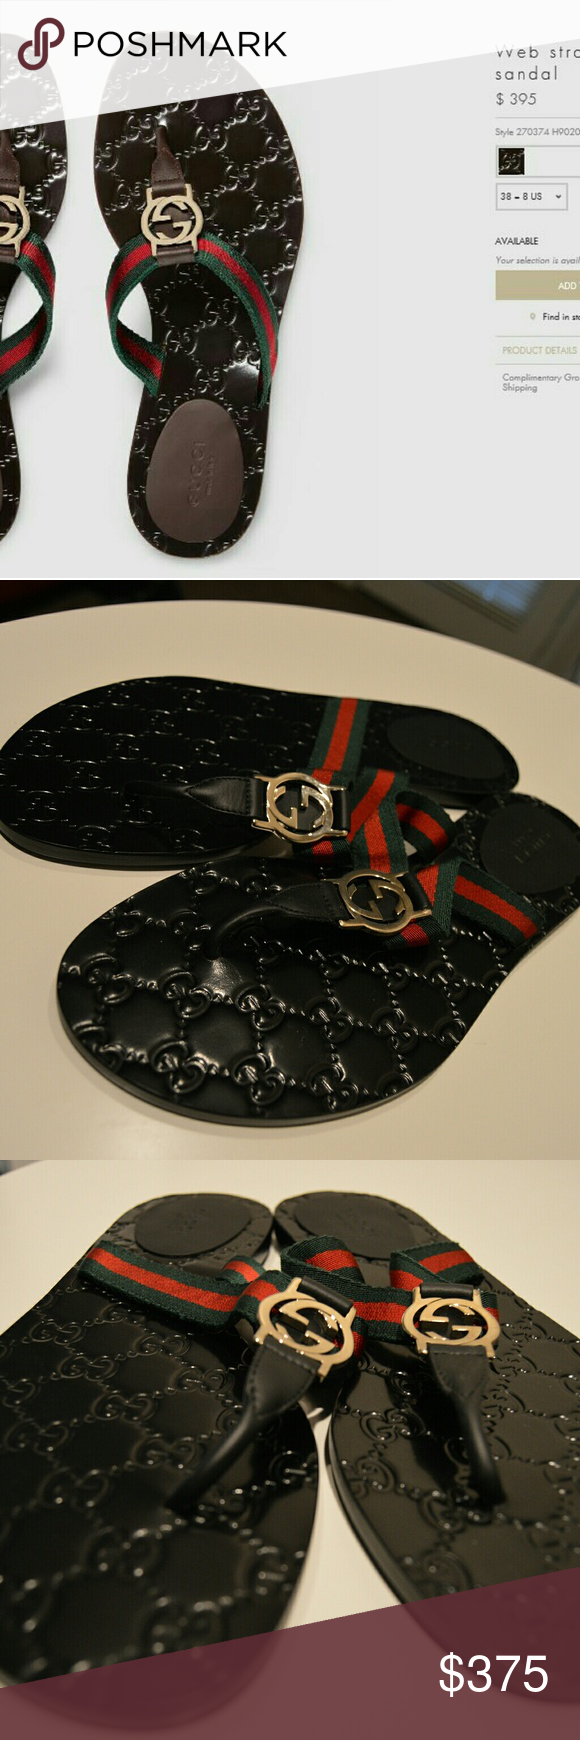 c723bd3db3f7 Gucci web strap thong sandal New never worn Gucci Shoes